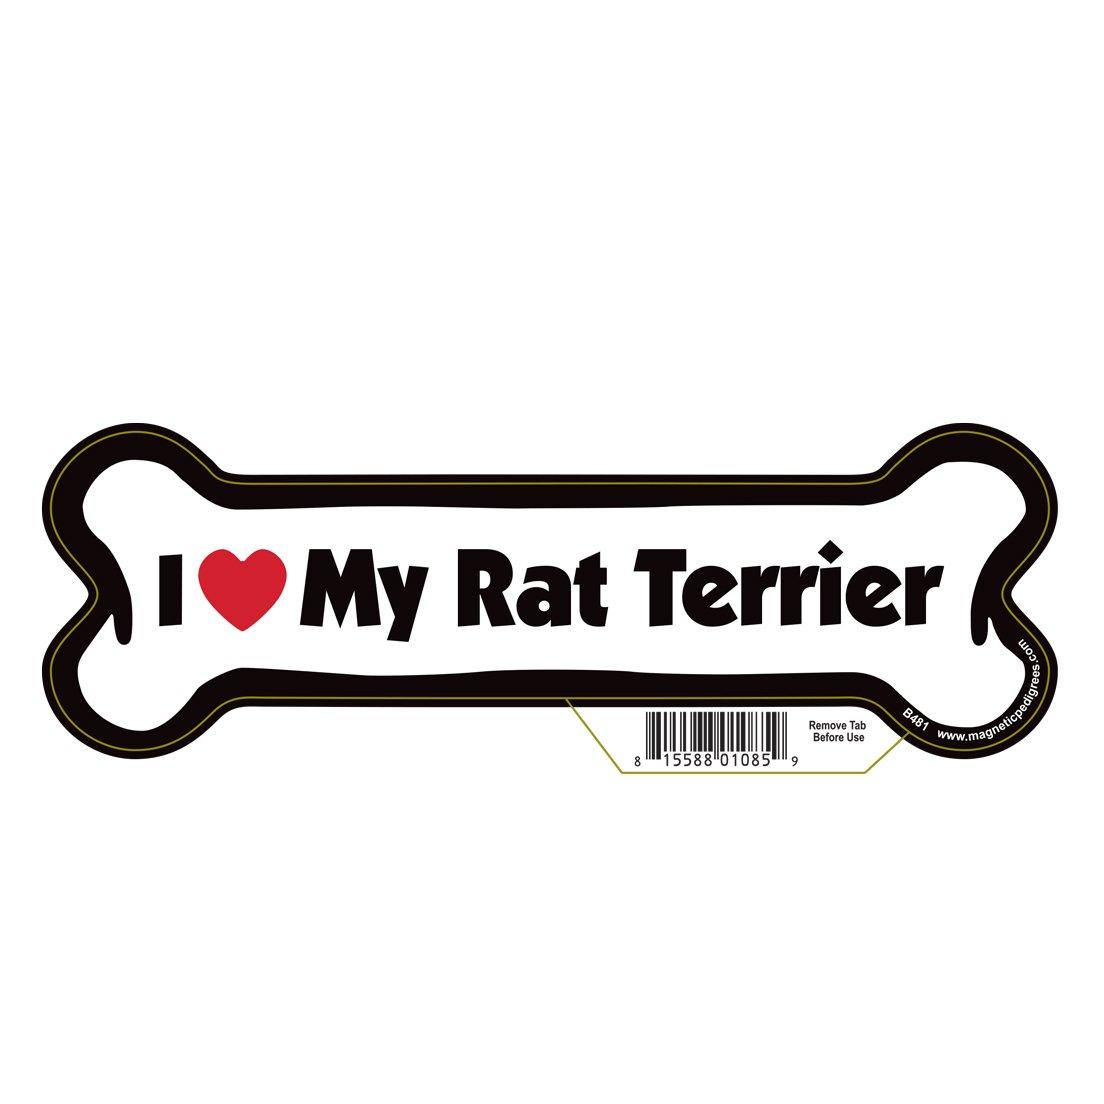 Rat Terrier Dog Bone Magnet